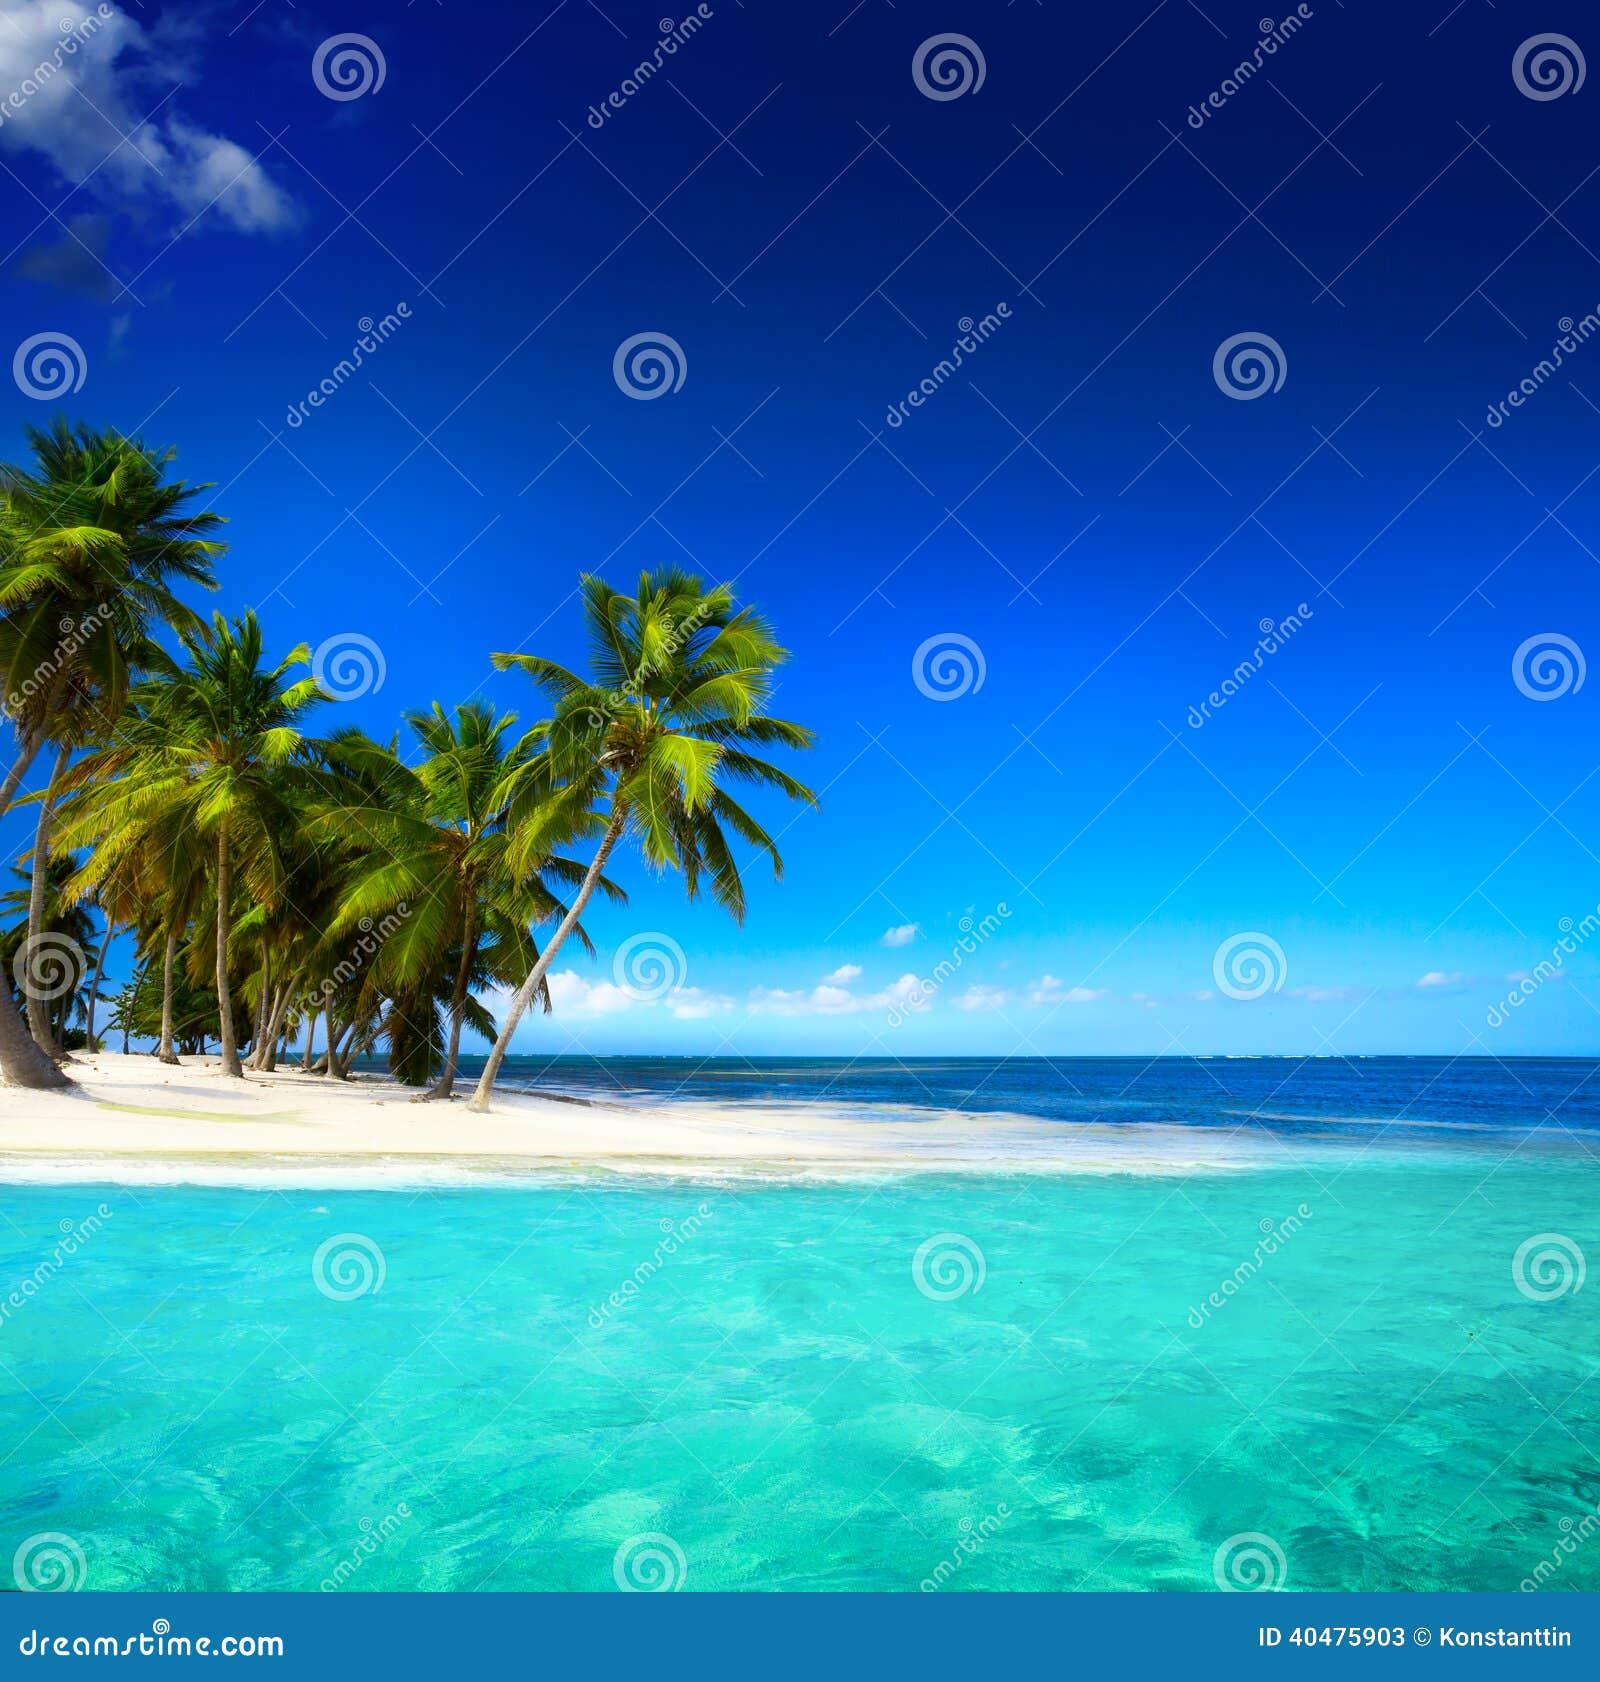 Tropical Island Beaches: Art Beautiful Seaside View Background Stock Image